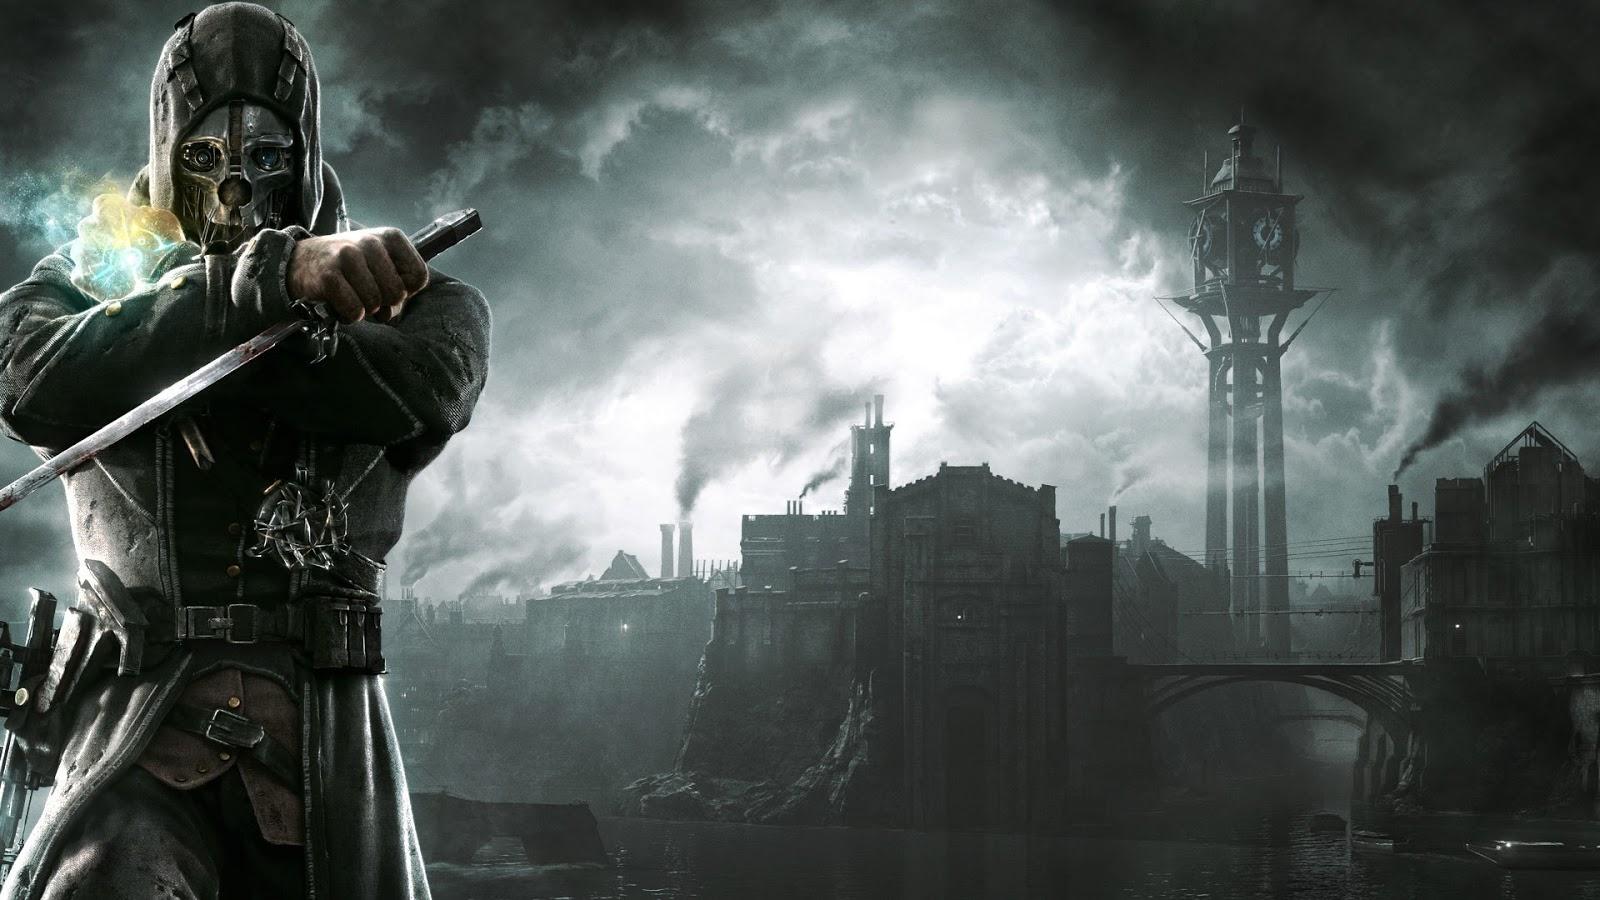 Dishonored (2012) | ডাইরেক্ট ডাউনলোড লিঙ্ক !!